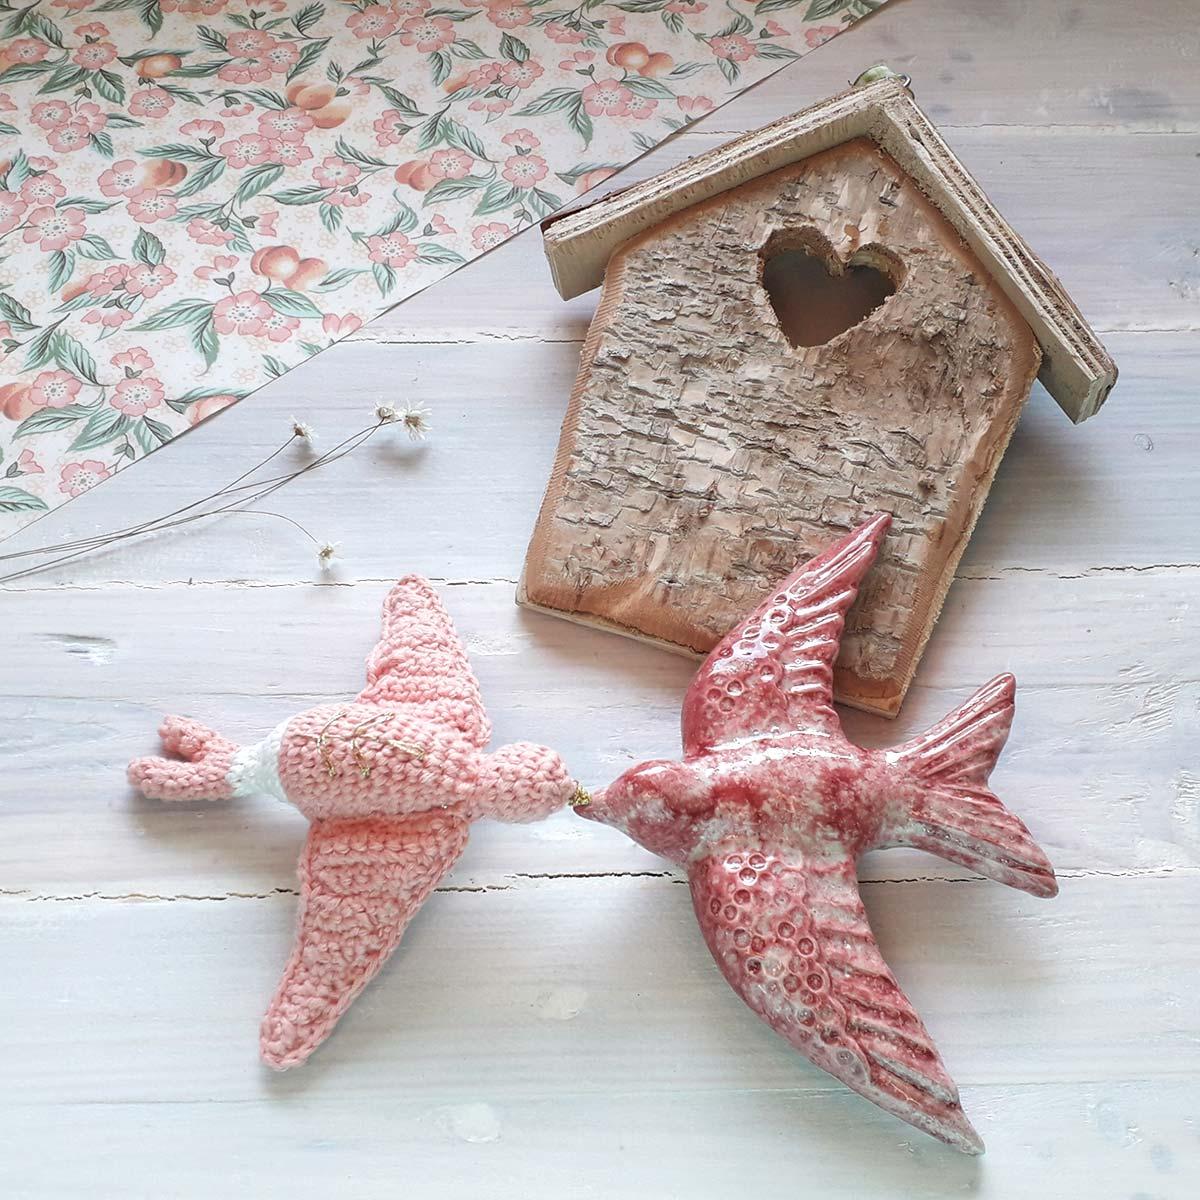 hirondelle-crochet-amigurumi-brigittabrou-diymelimelo